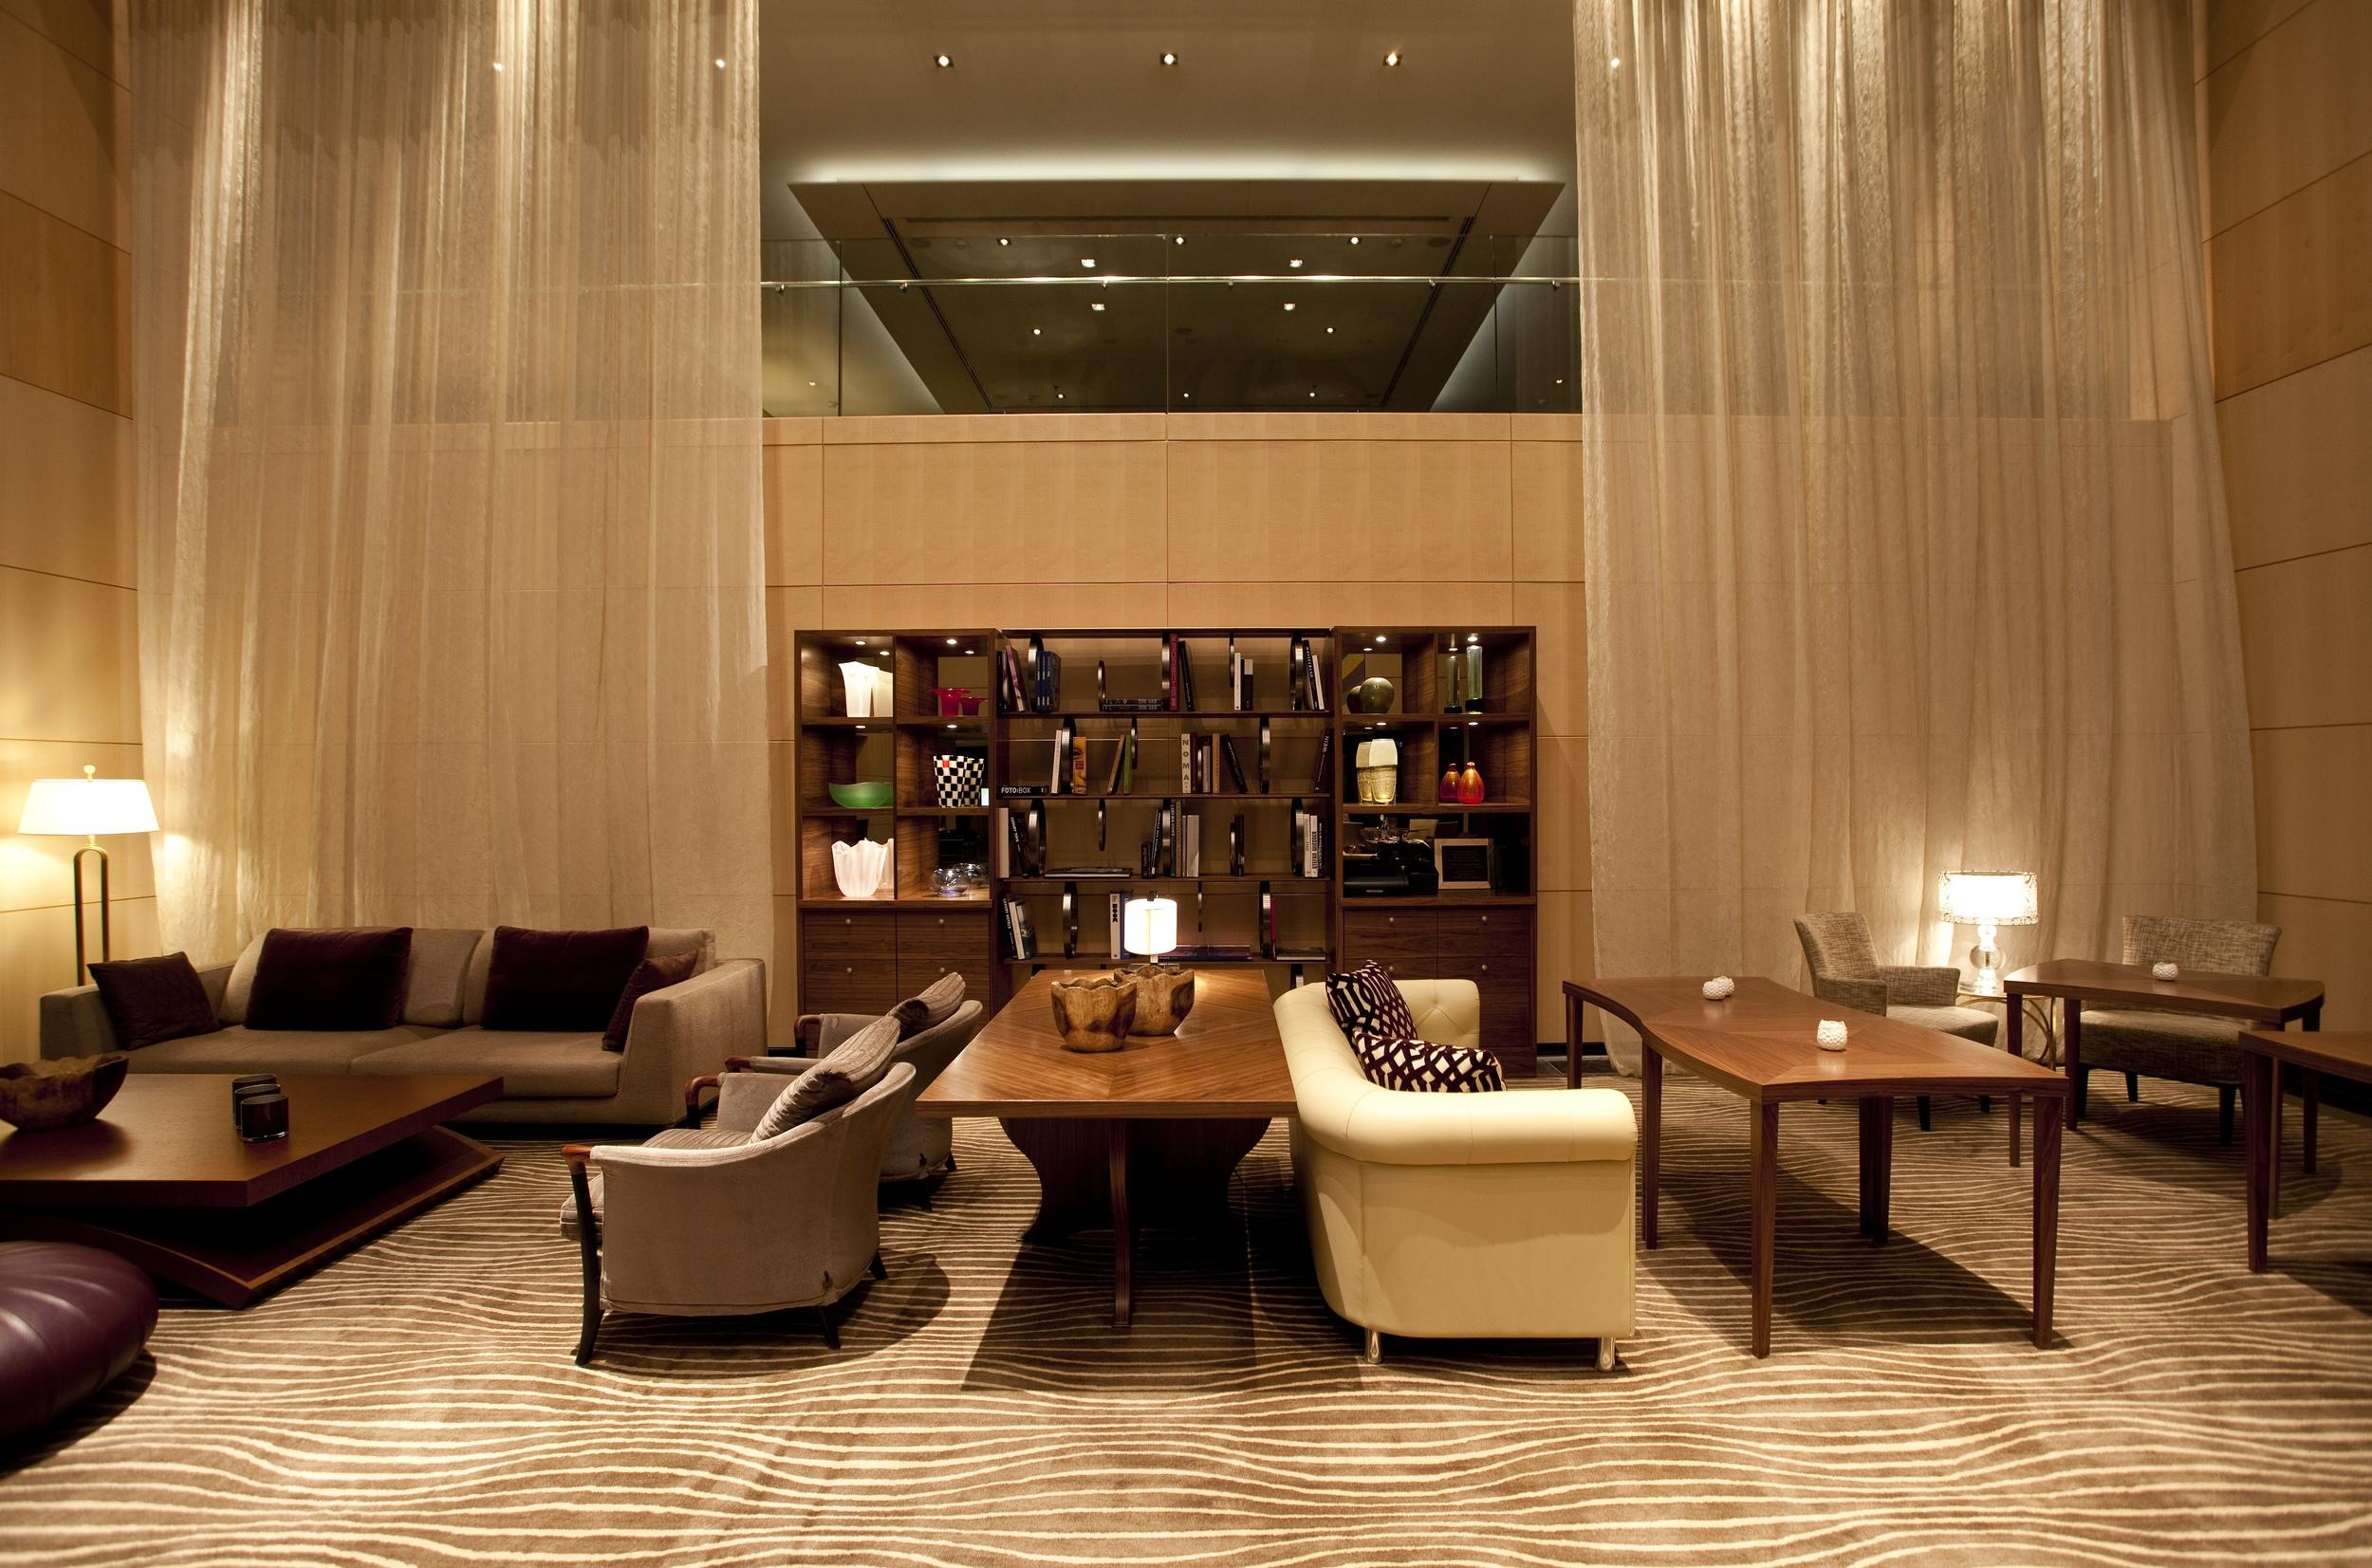 PHZ_Lobby Lounge library horizontal (2) copy 2.jpg